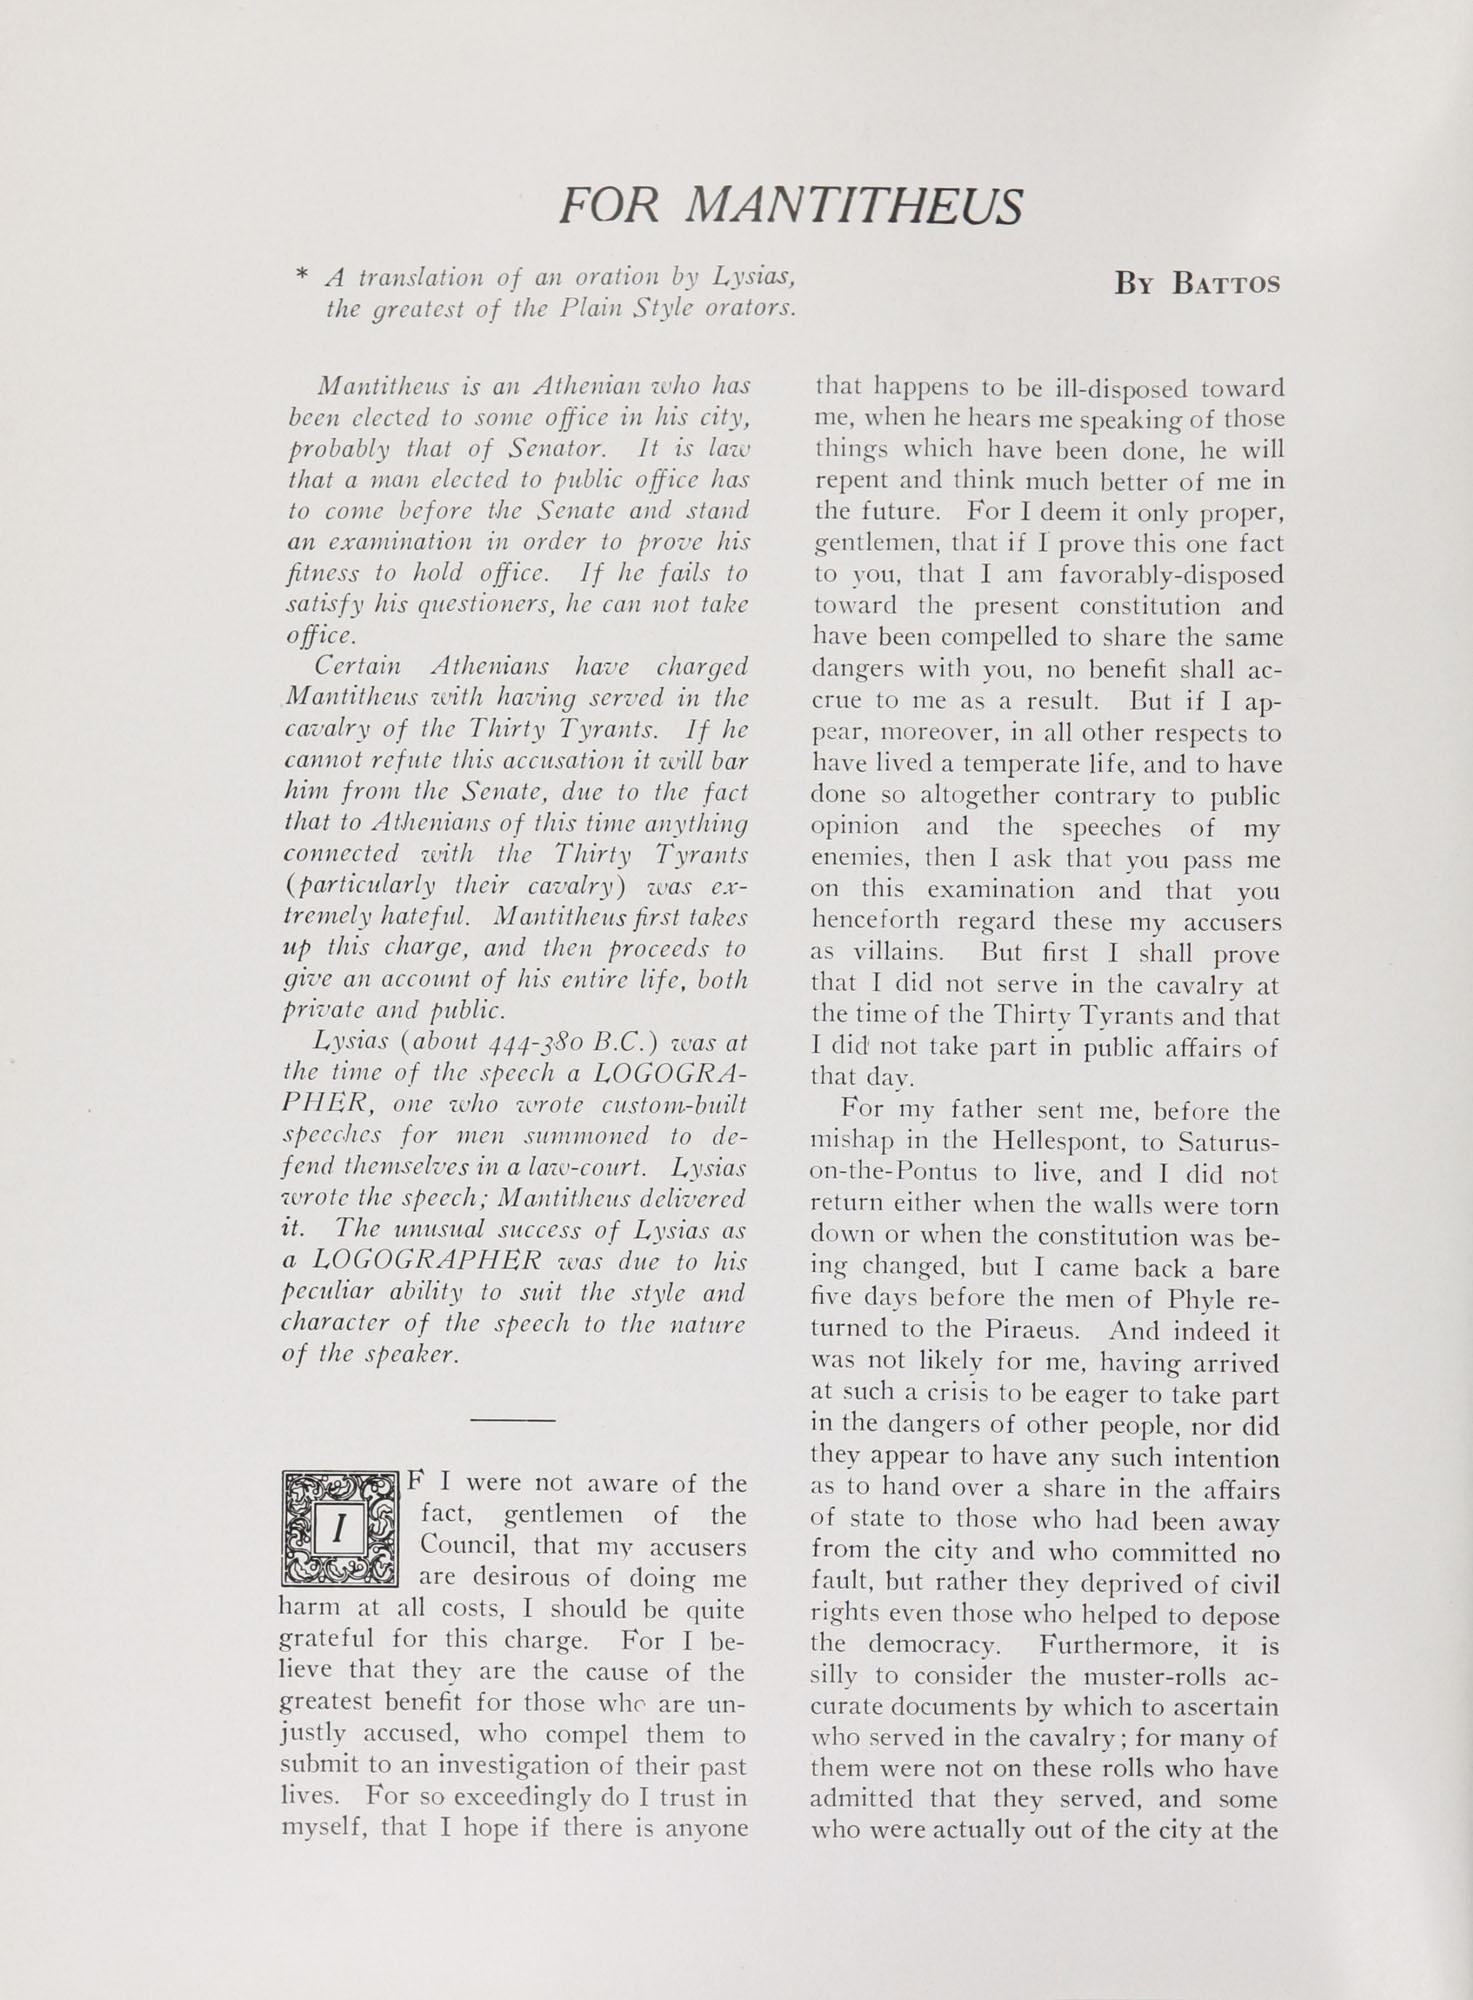 College of Charleston Magazine, 1938-1939, Vol. XXXXII No. 1, page 10